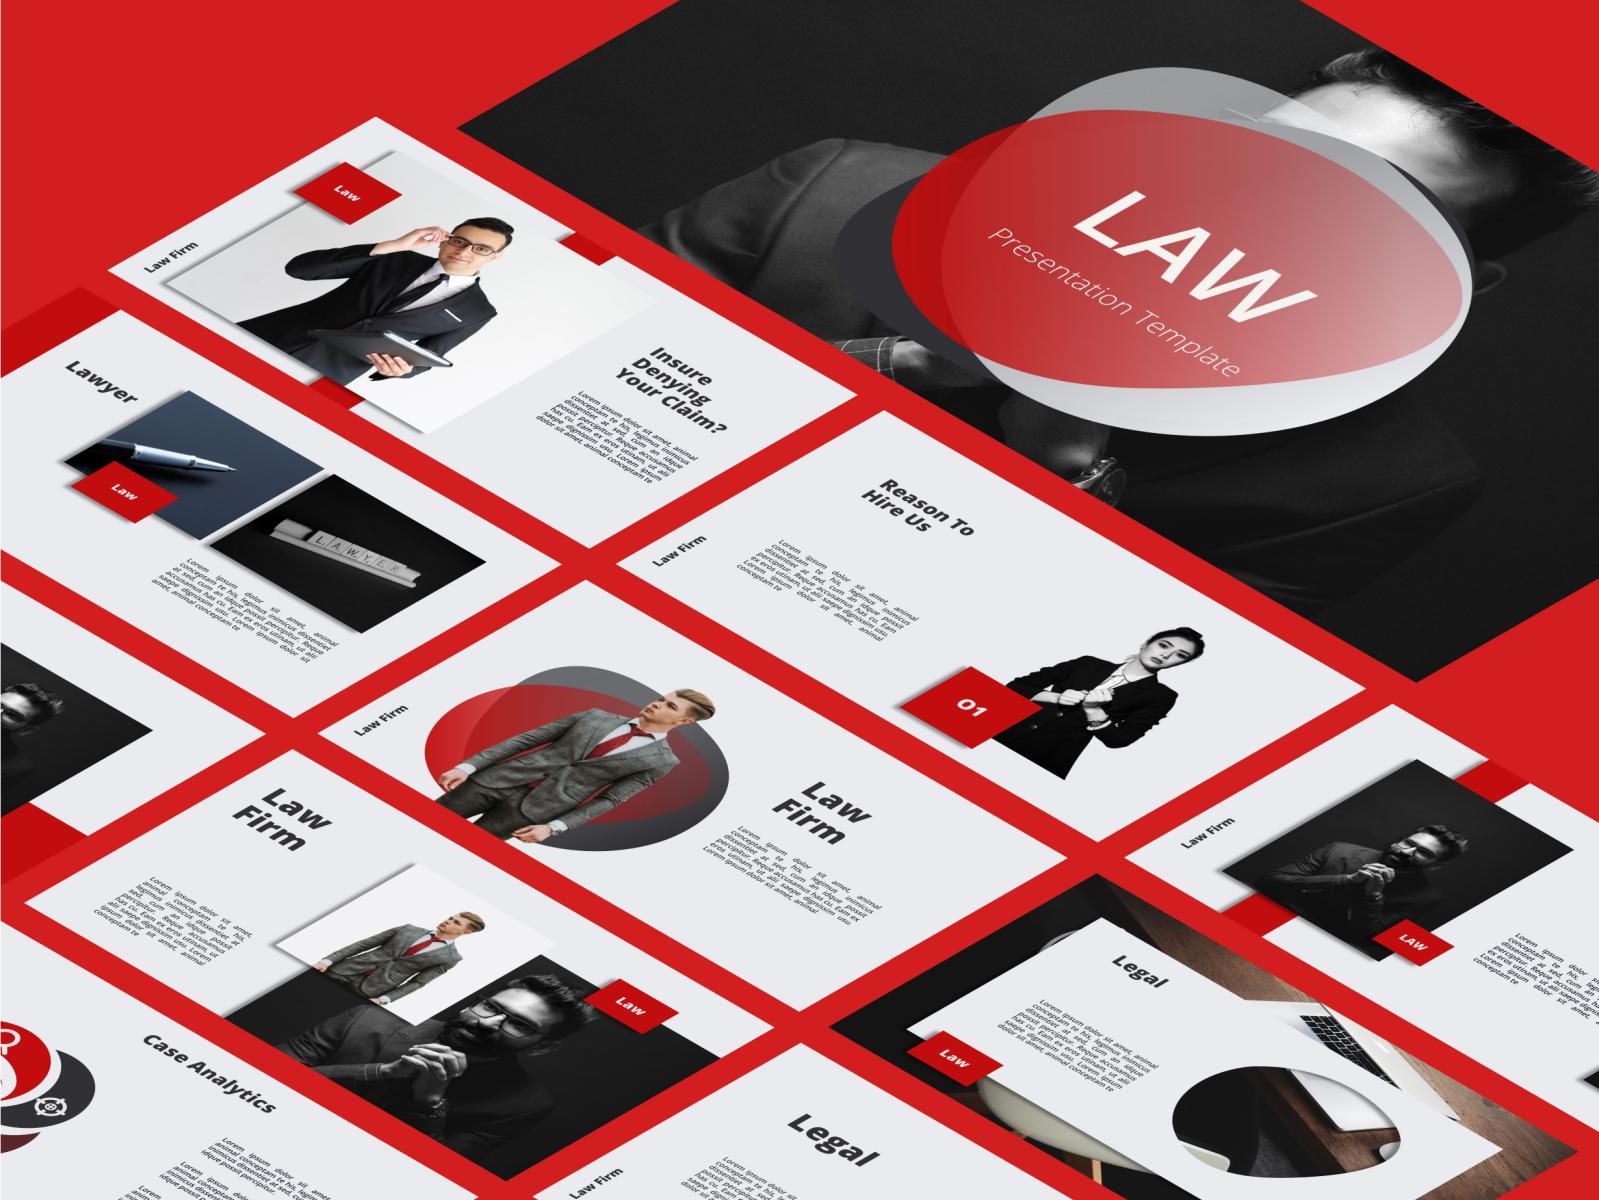 Law Legal Attourney Lawyer Powerpoint Presentation